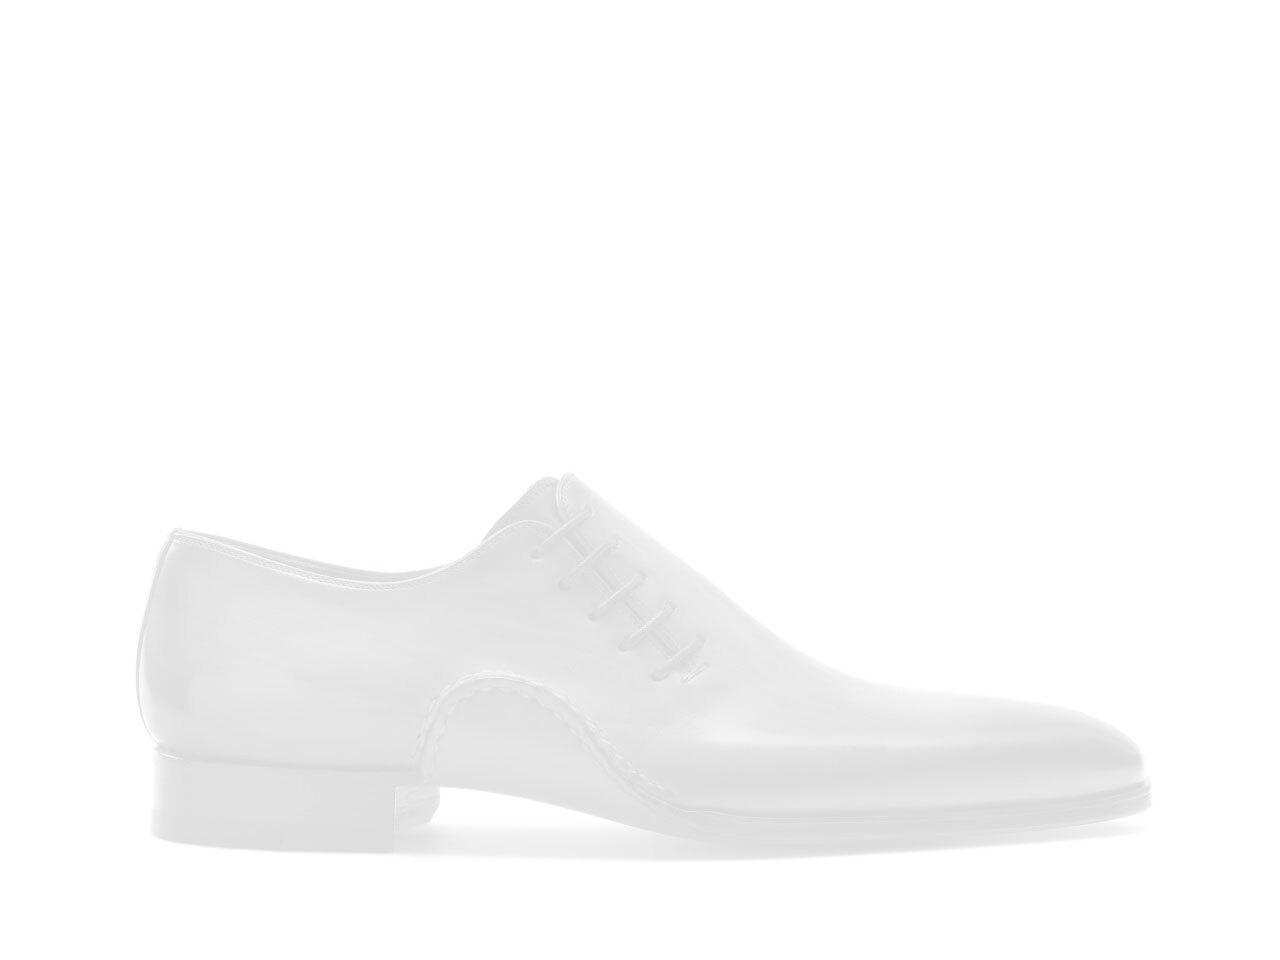 Side view of the Magnanni Bolo Cognac Men's Oxford Shoes